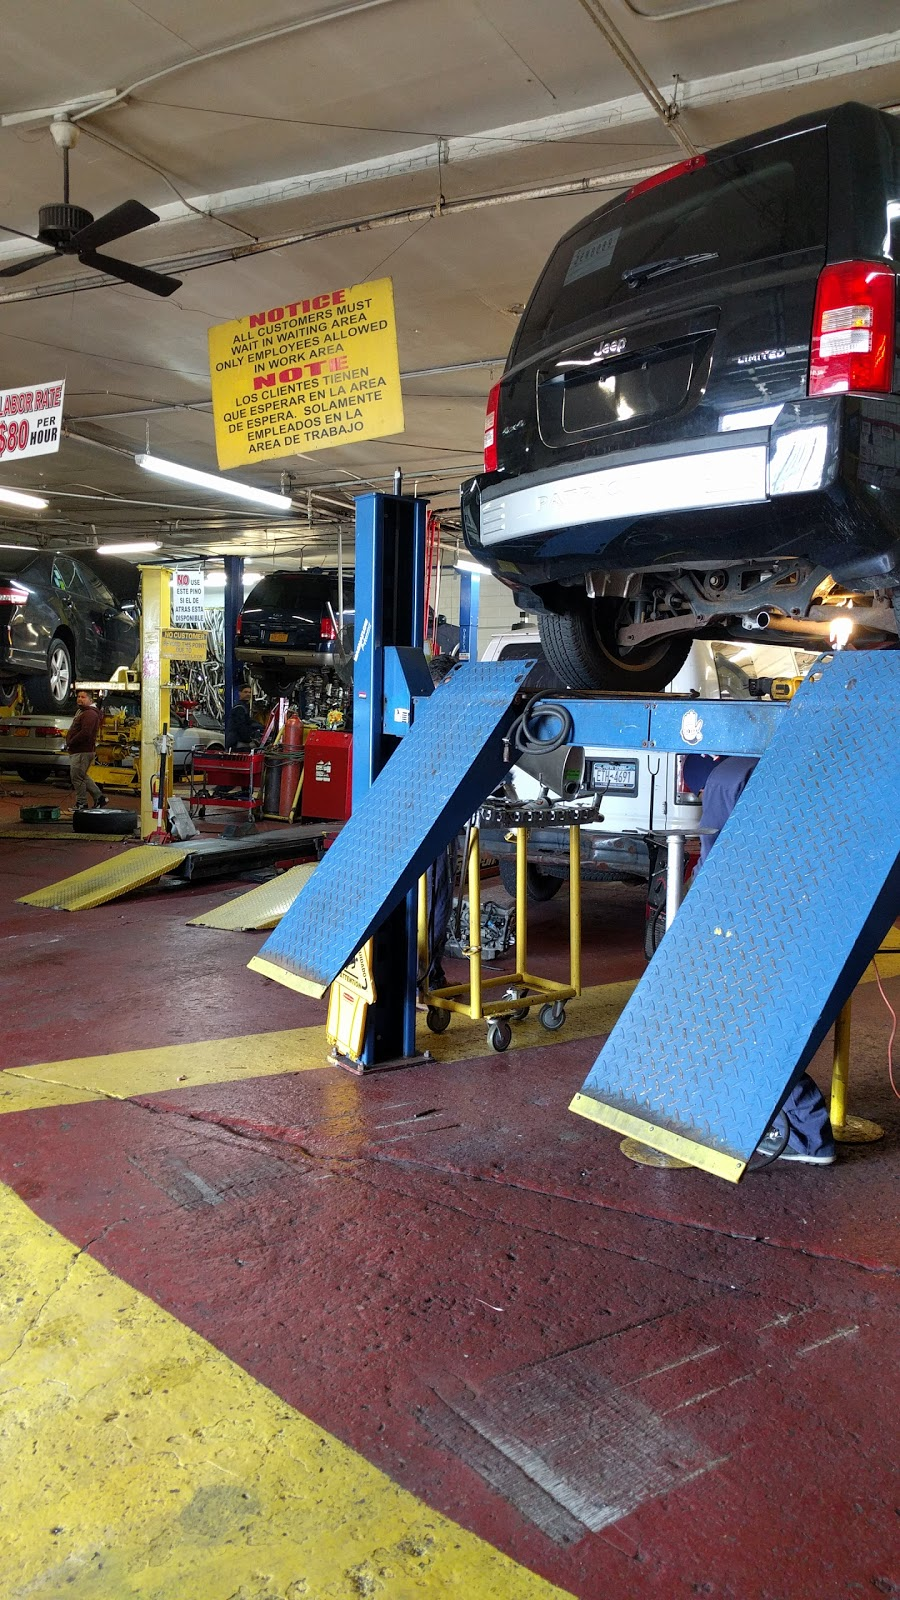 Bronx Discount Muffler Center - car repair    Photo 5 of 10   Address: 501 Bruckner Blvd, Bronx, NY 10455, USA   Phone: (718) 402-4422